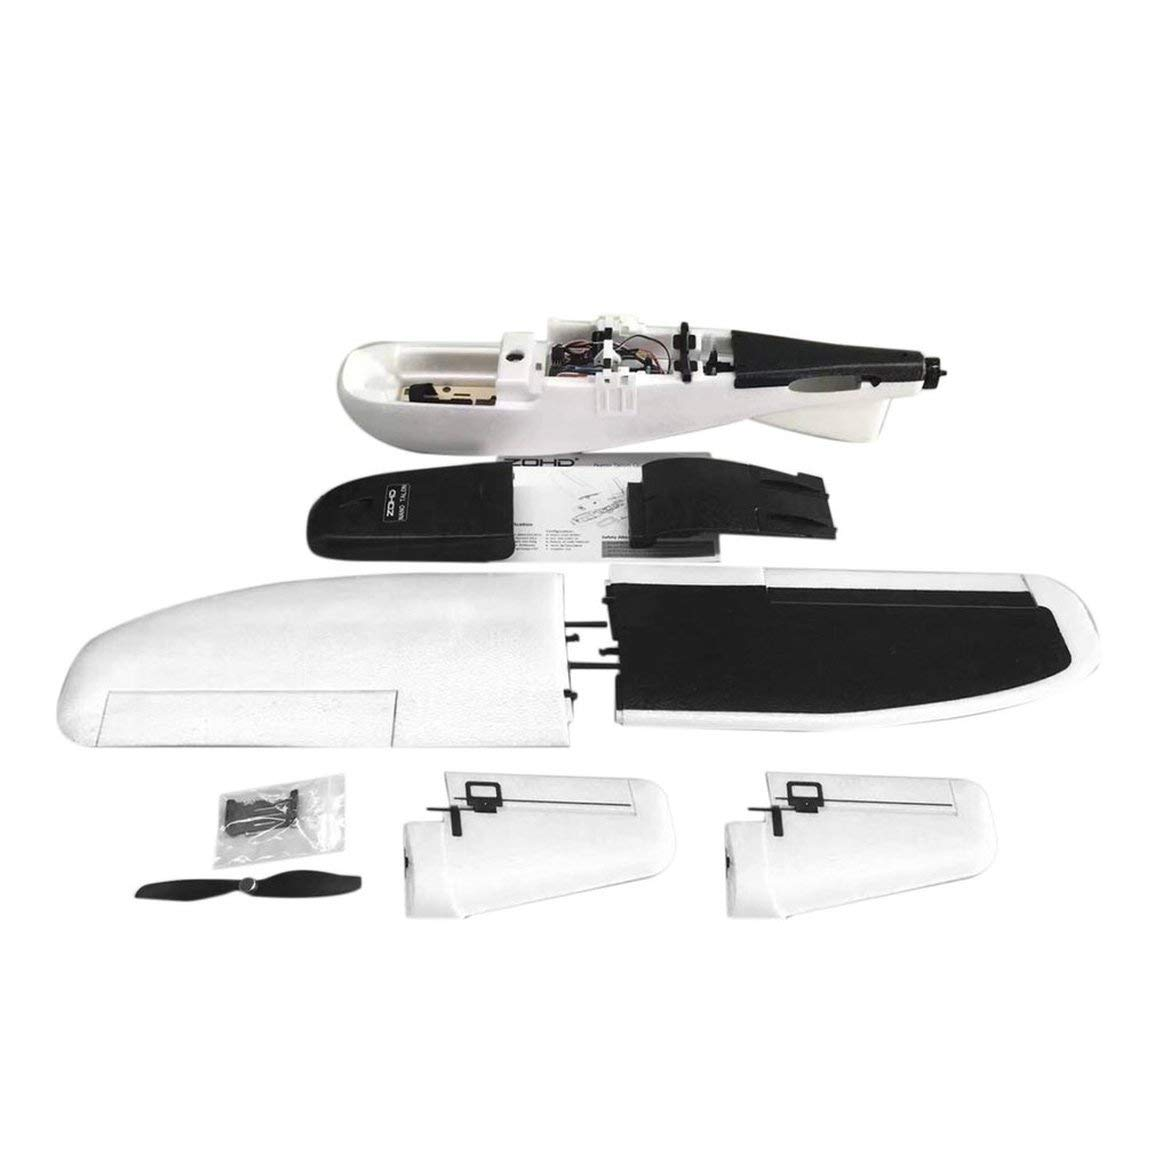 Fantasyworld Fantasyworld Fantasyworld ZOHD Nano Talon 860mm Spannweite Abnehmbare V-Leitwerk EPP RC FPV Flugzeug Flugzeug-Modell PNP Version mit Motor Gyro Servos ec383a